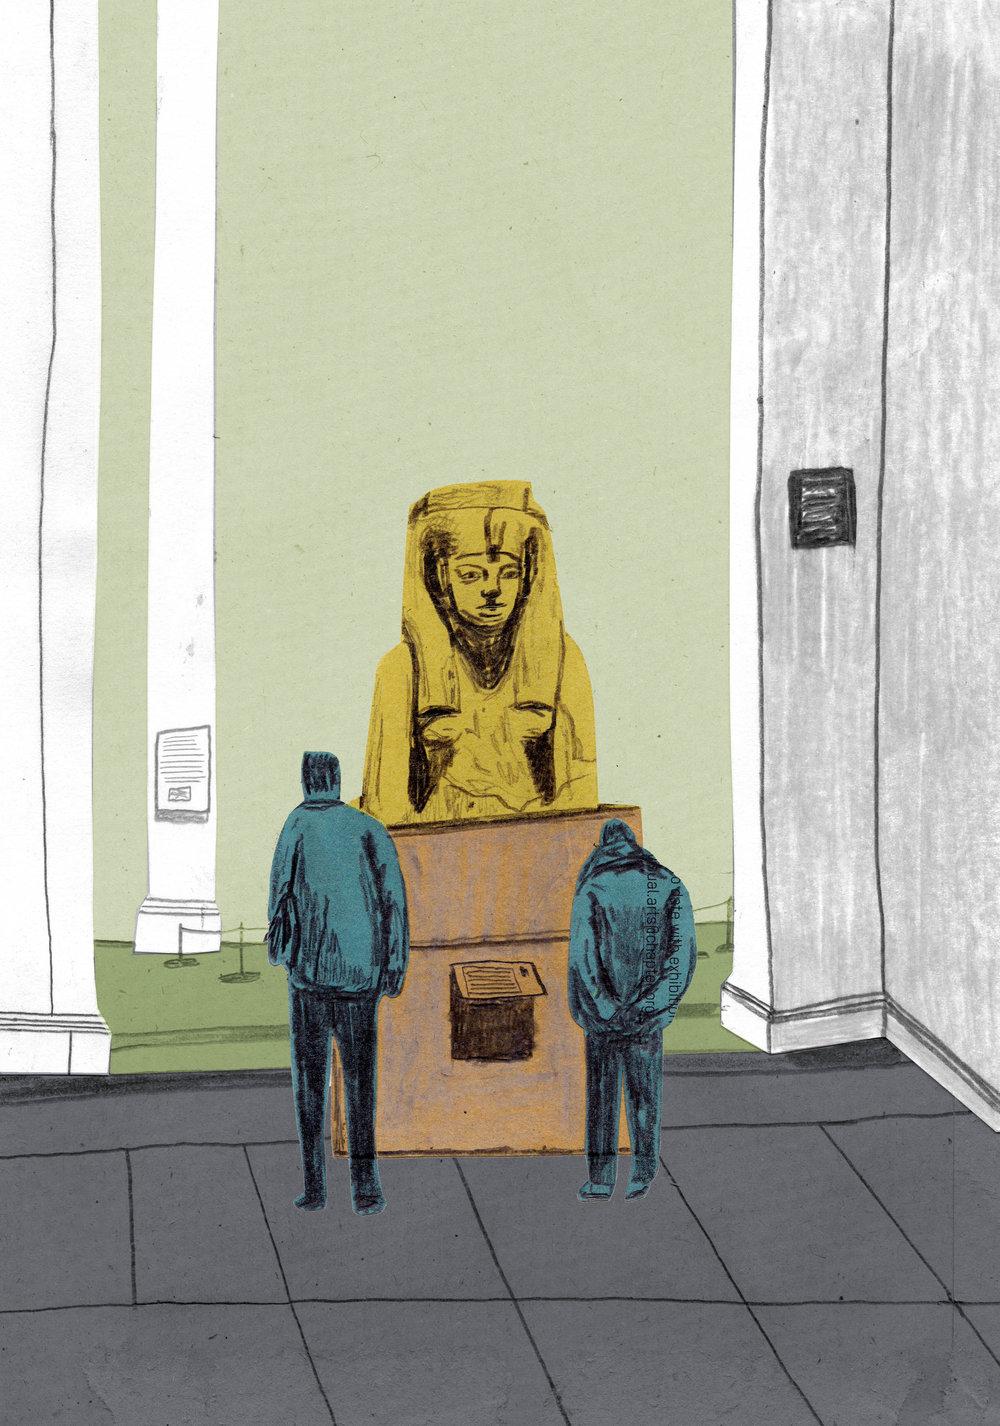 statue+1+original+WEB.jpg